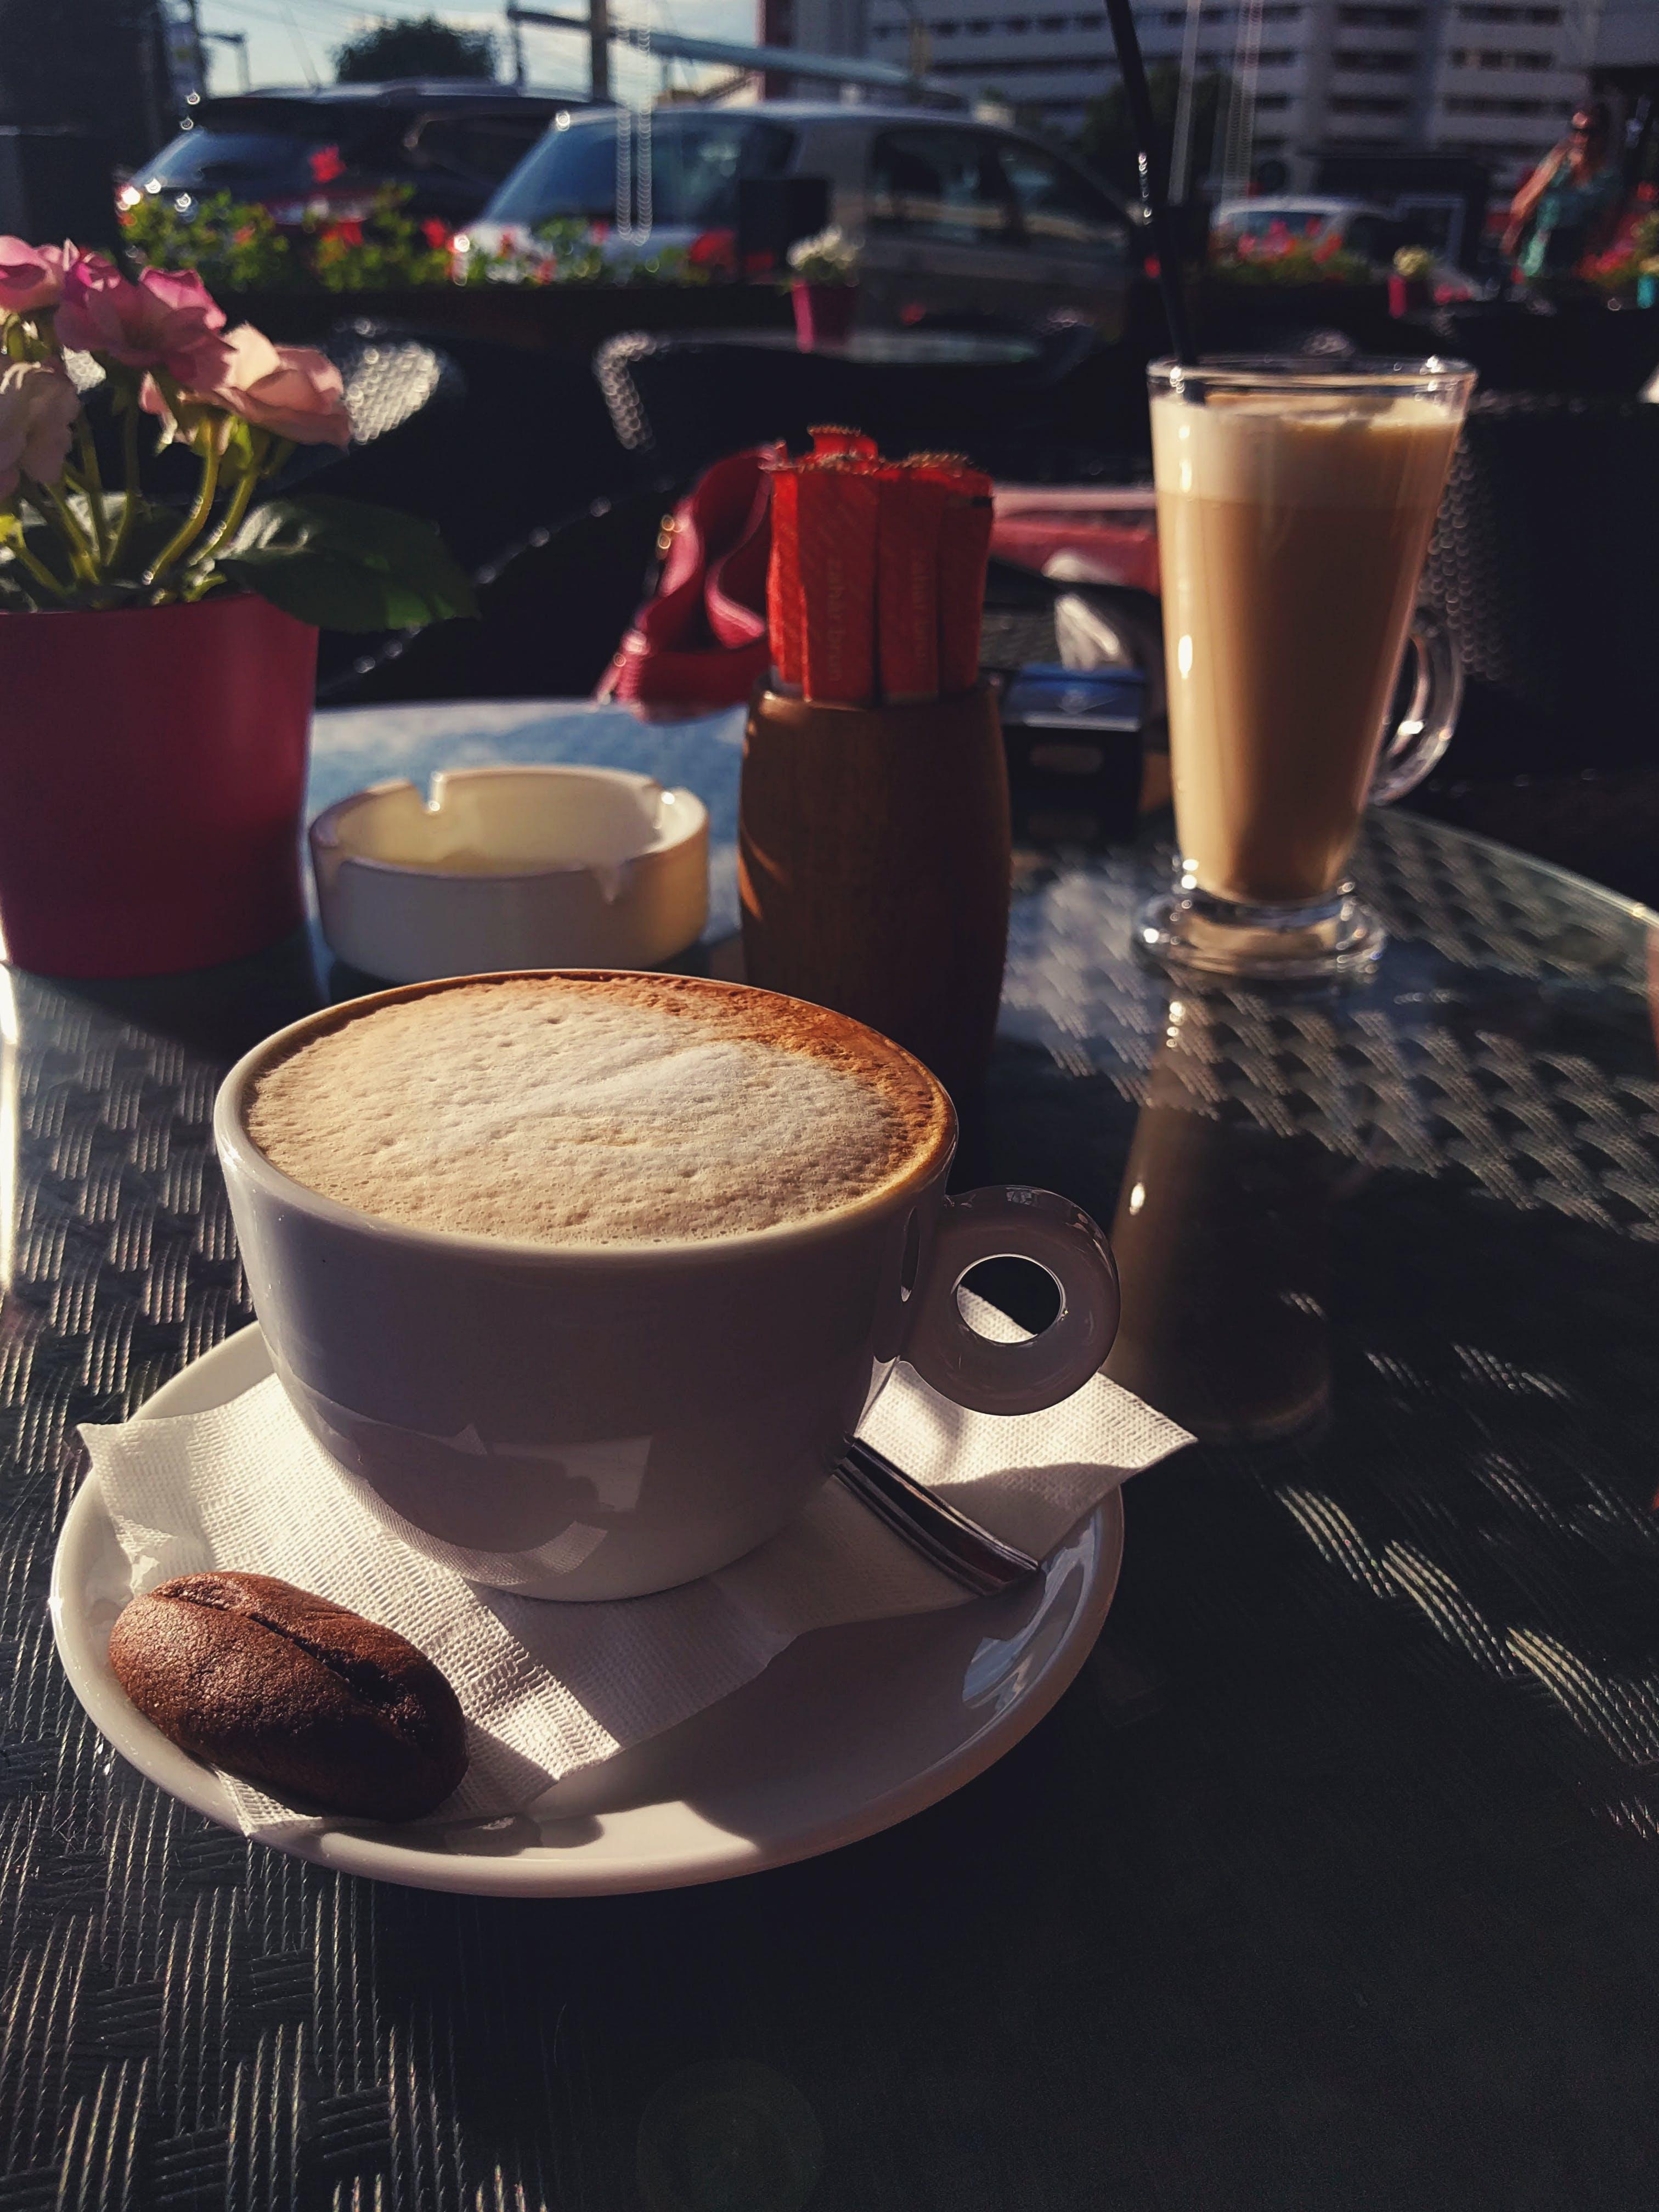 Fotos de stock gratuitas de beber, café, café exprés, cafeína